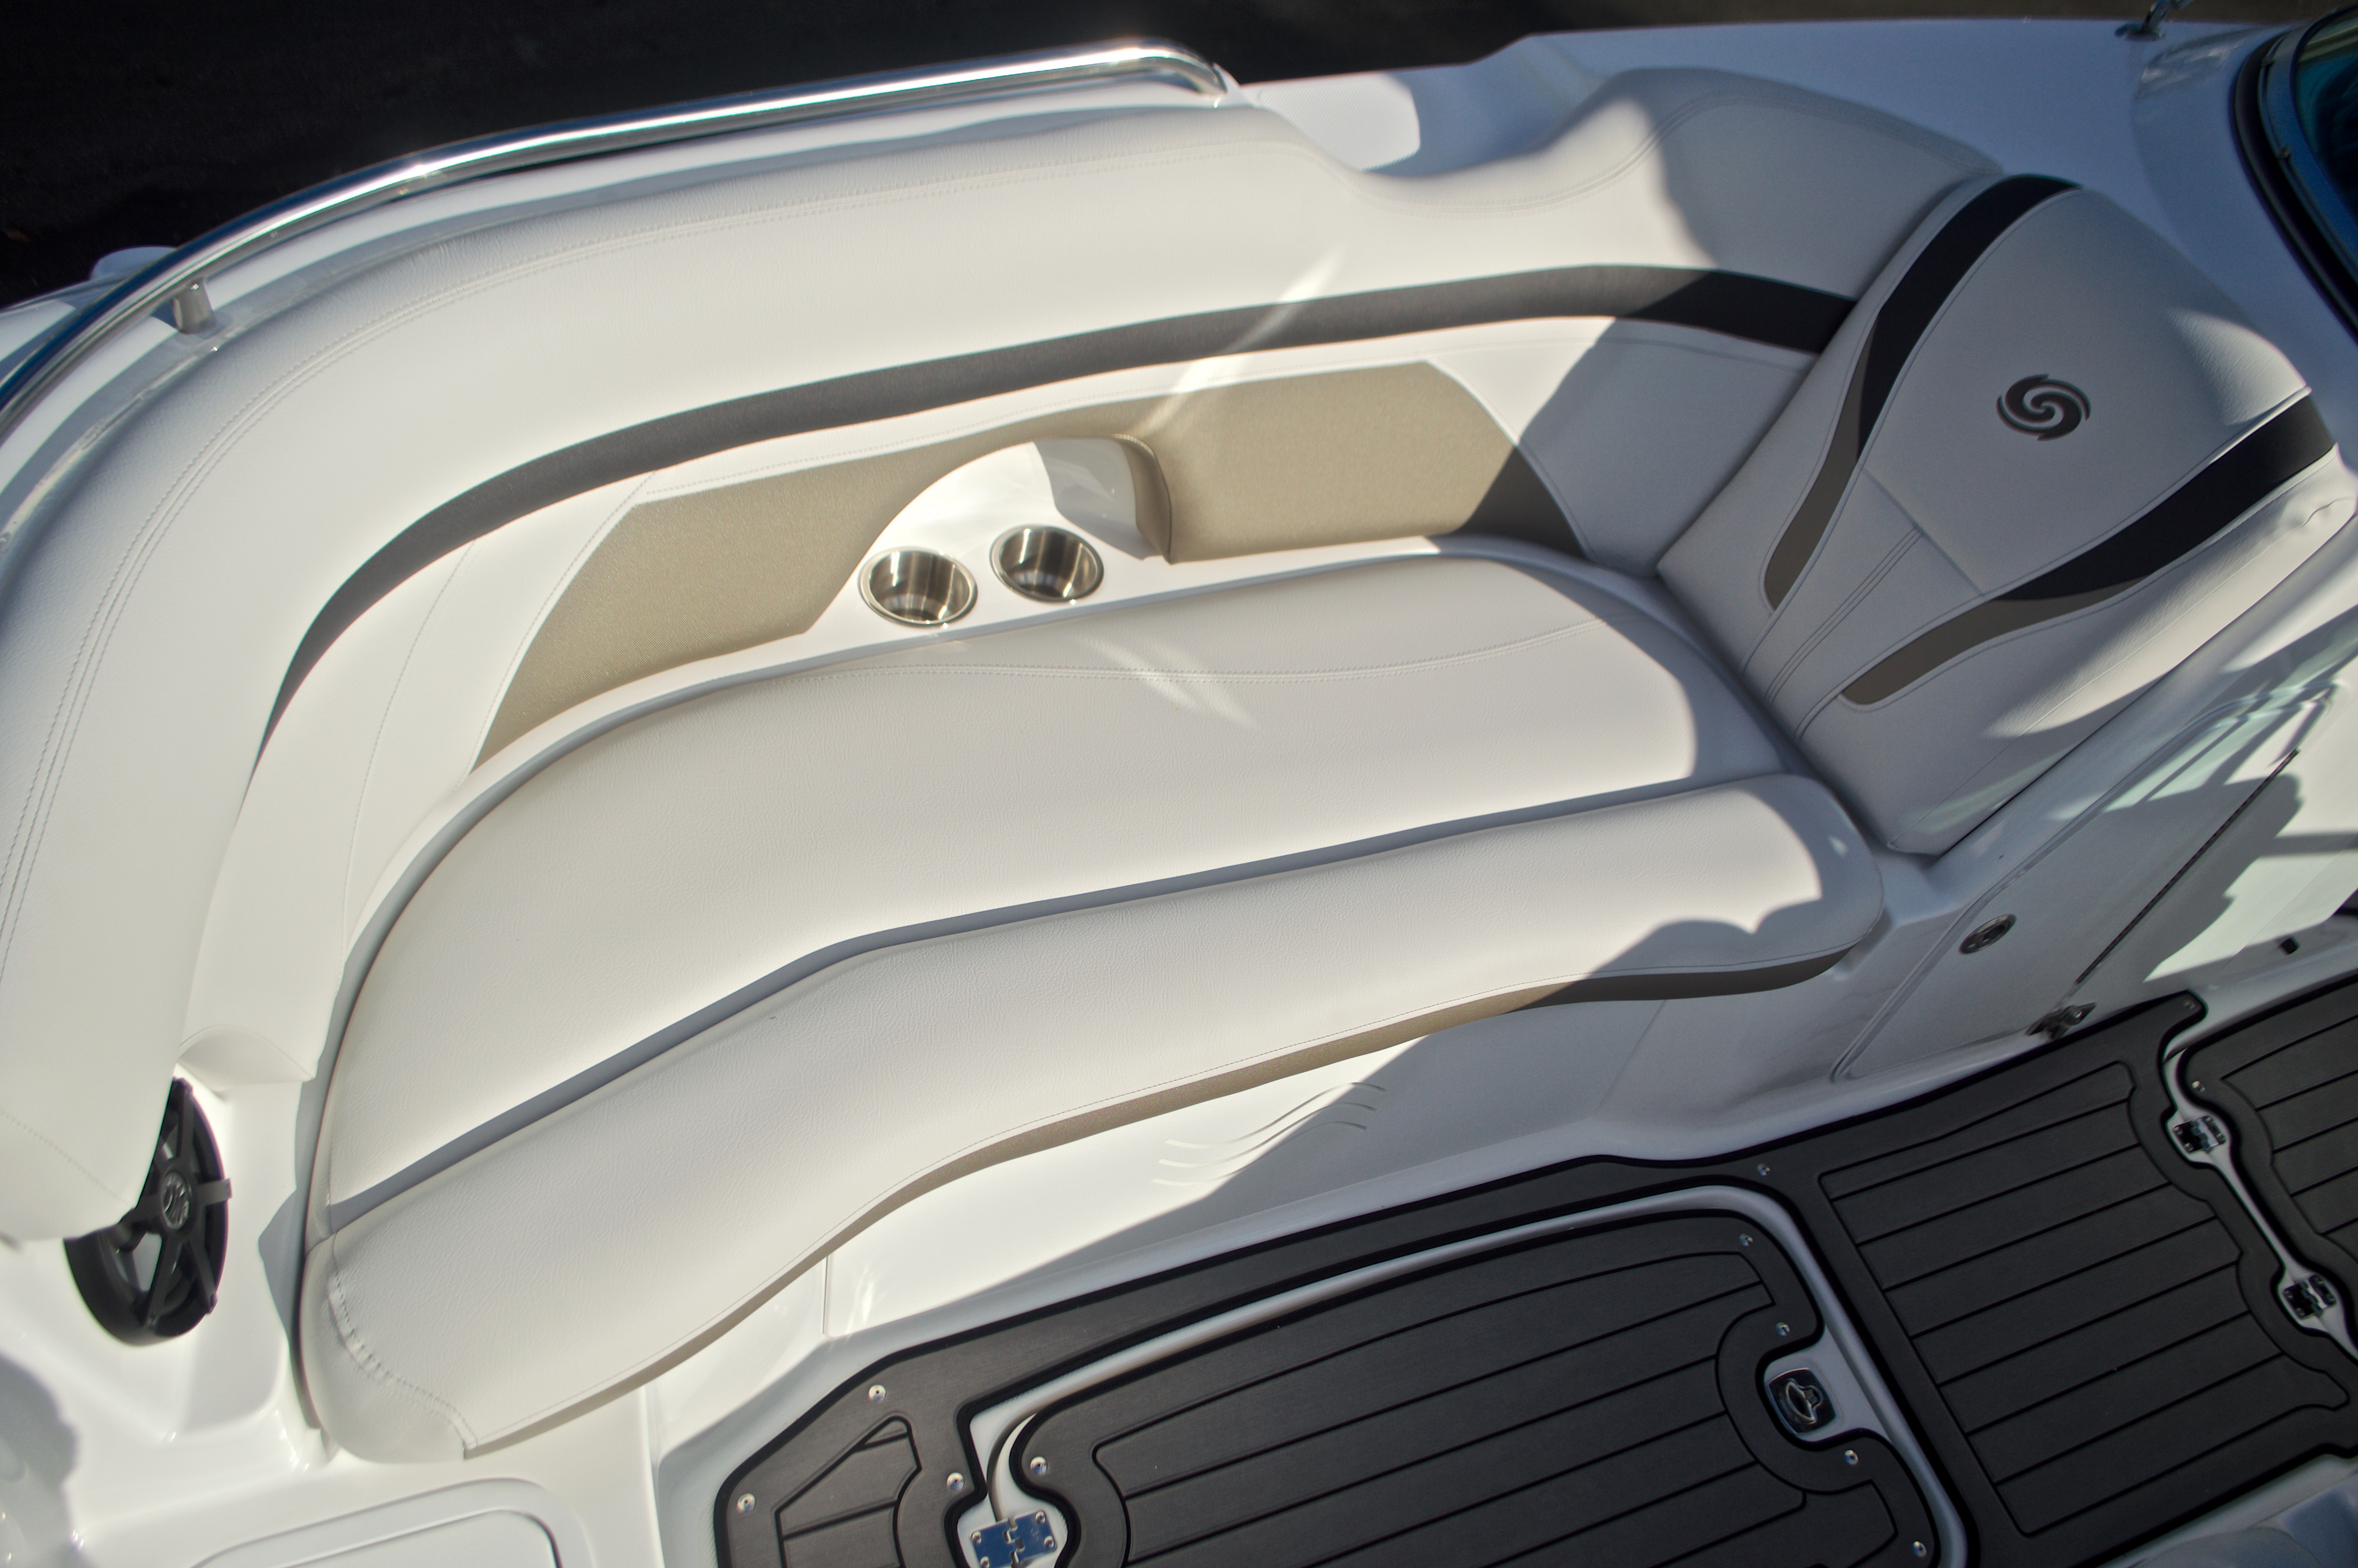 Thumbnail 60 for New 2017 Hurricane SunDeck SD 2400 OB boat for sale in Miami, FL